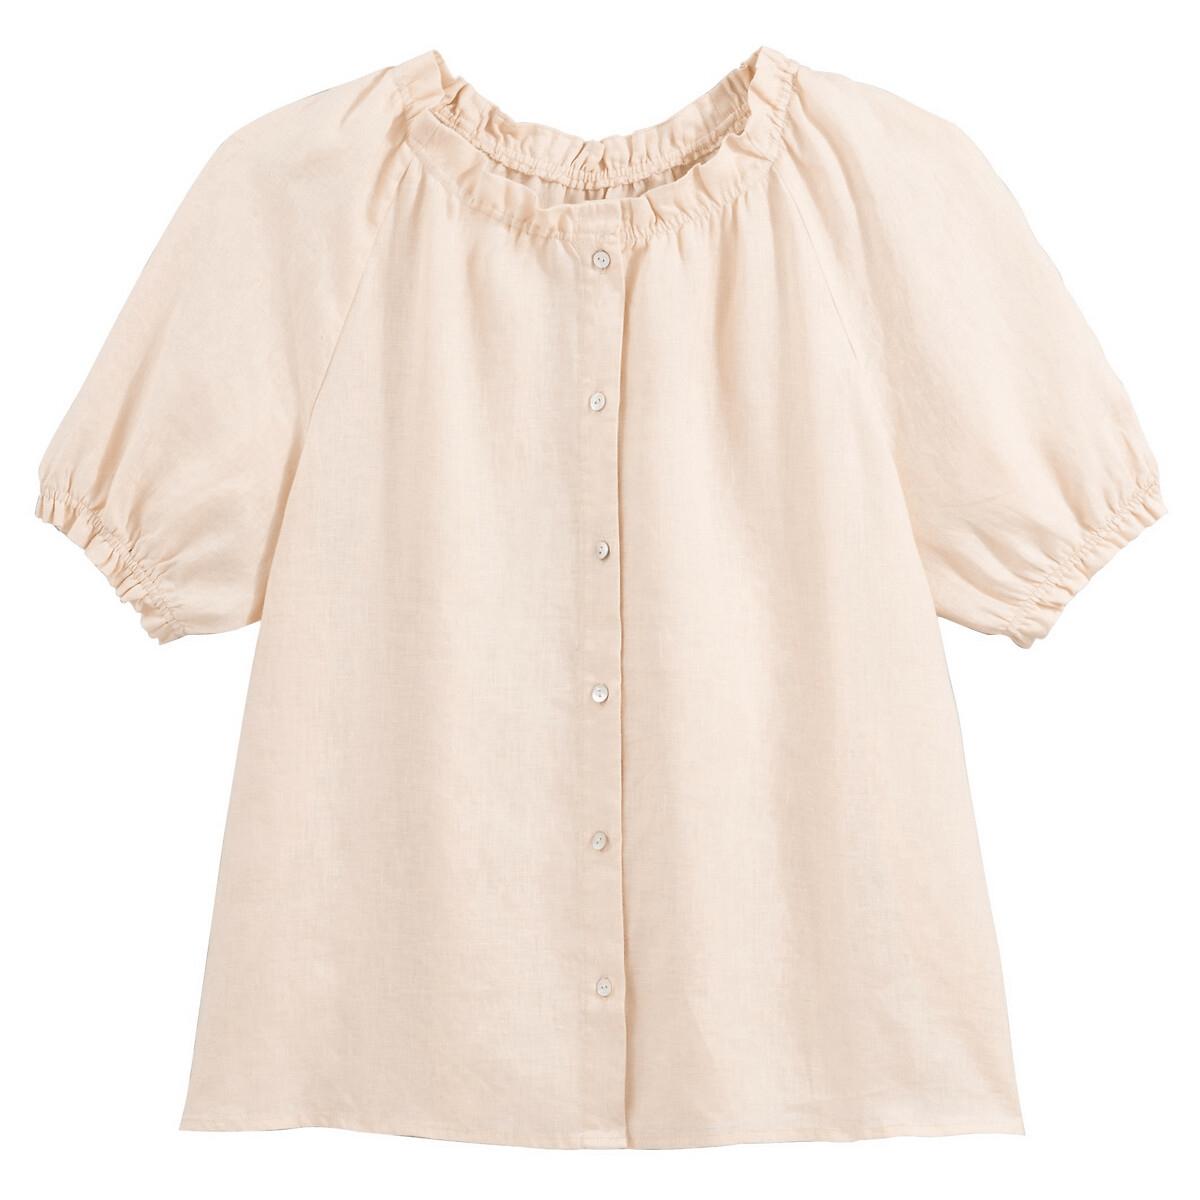 Camisa con cuello redondo y manga corta farolillo de lino